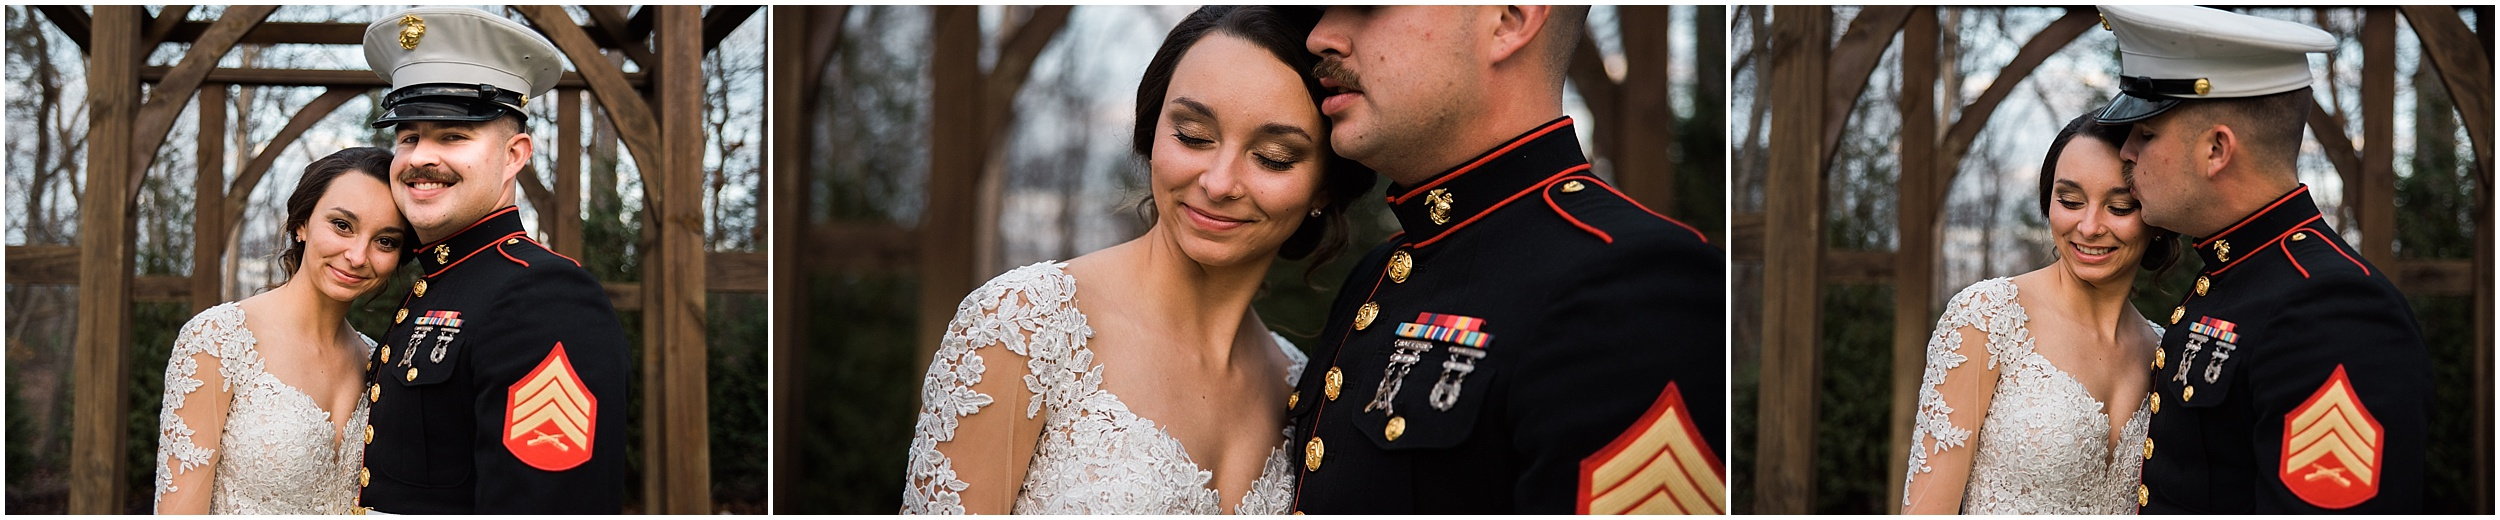 Ariel & Josh Southern Wedding in Monroe, North Carolina_0075.jpg